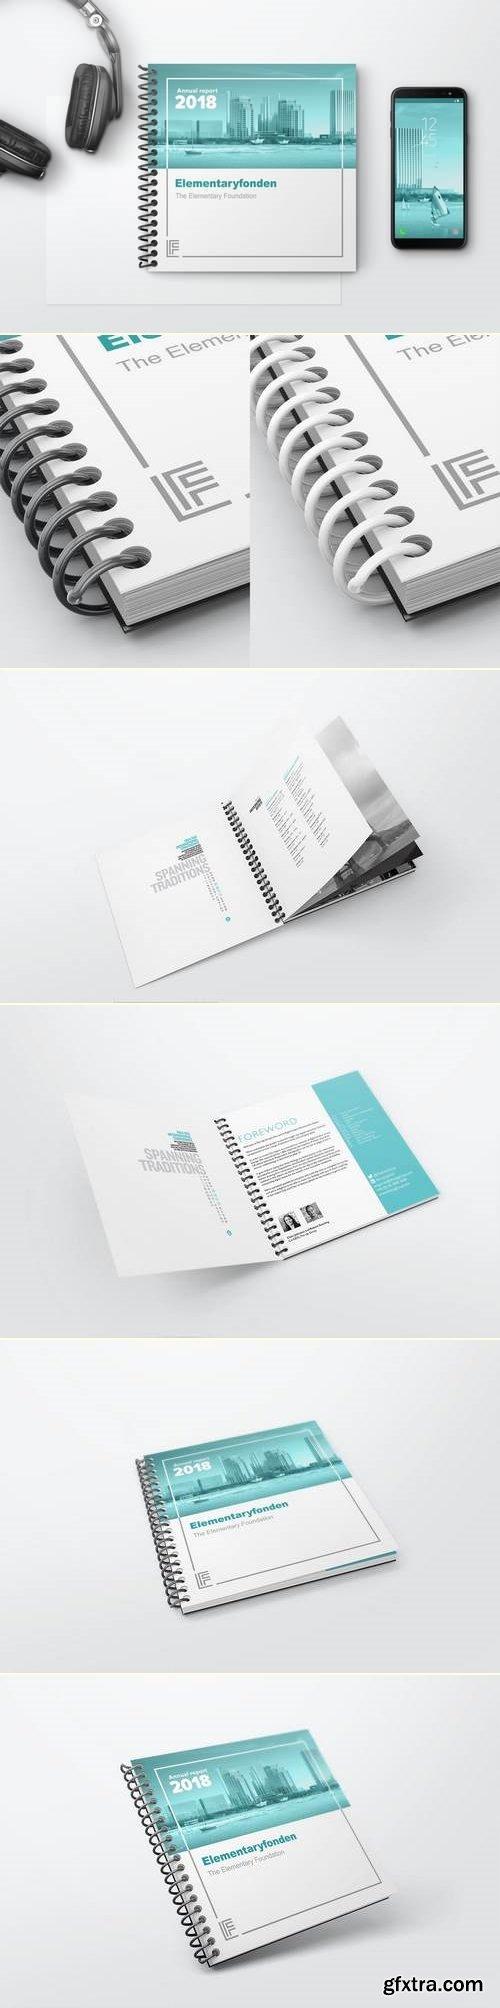 Spiral Book Binding Mockups 02